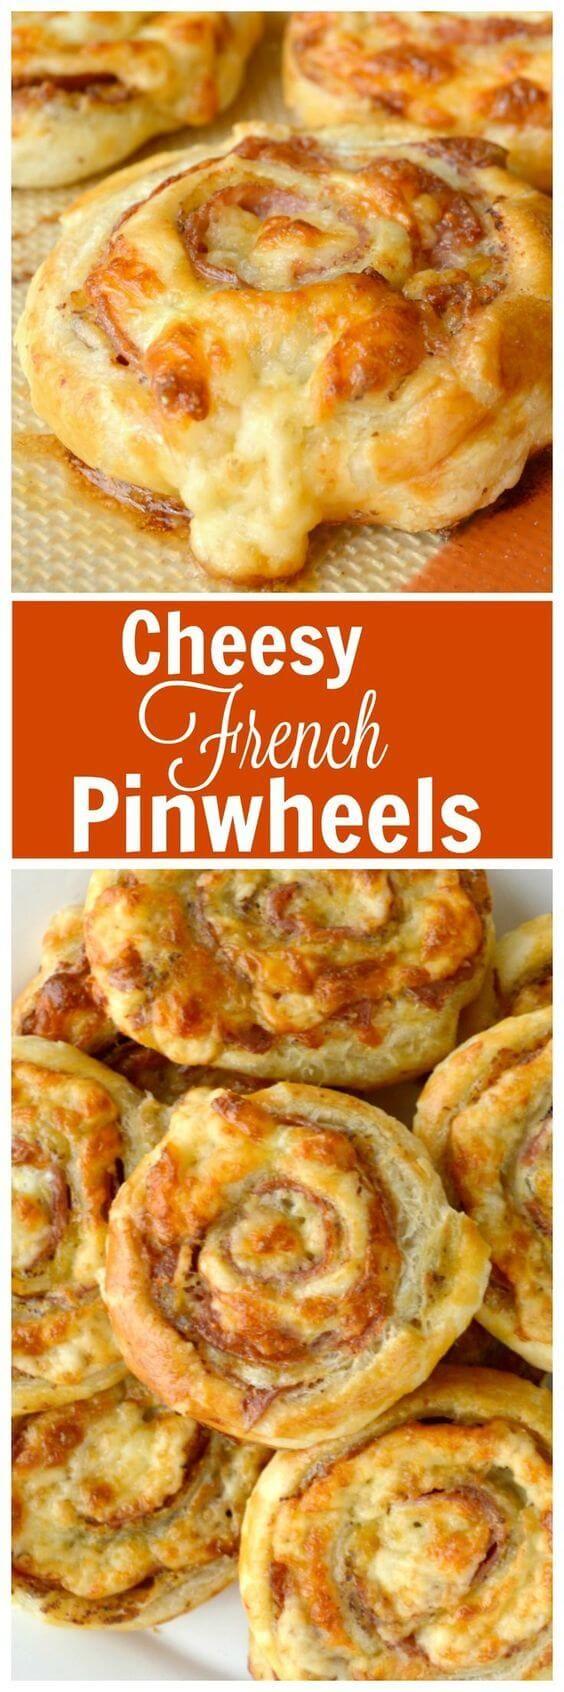 Quick & Easy Cheesy French Pinwheels Recipe